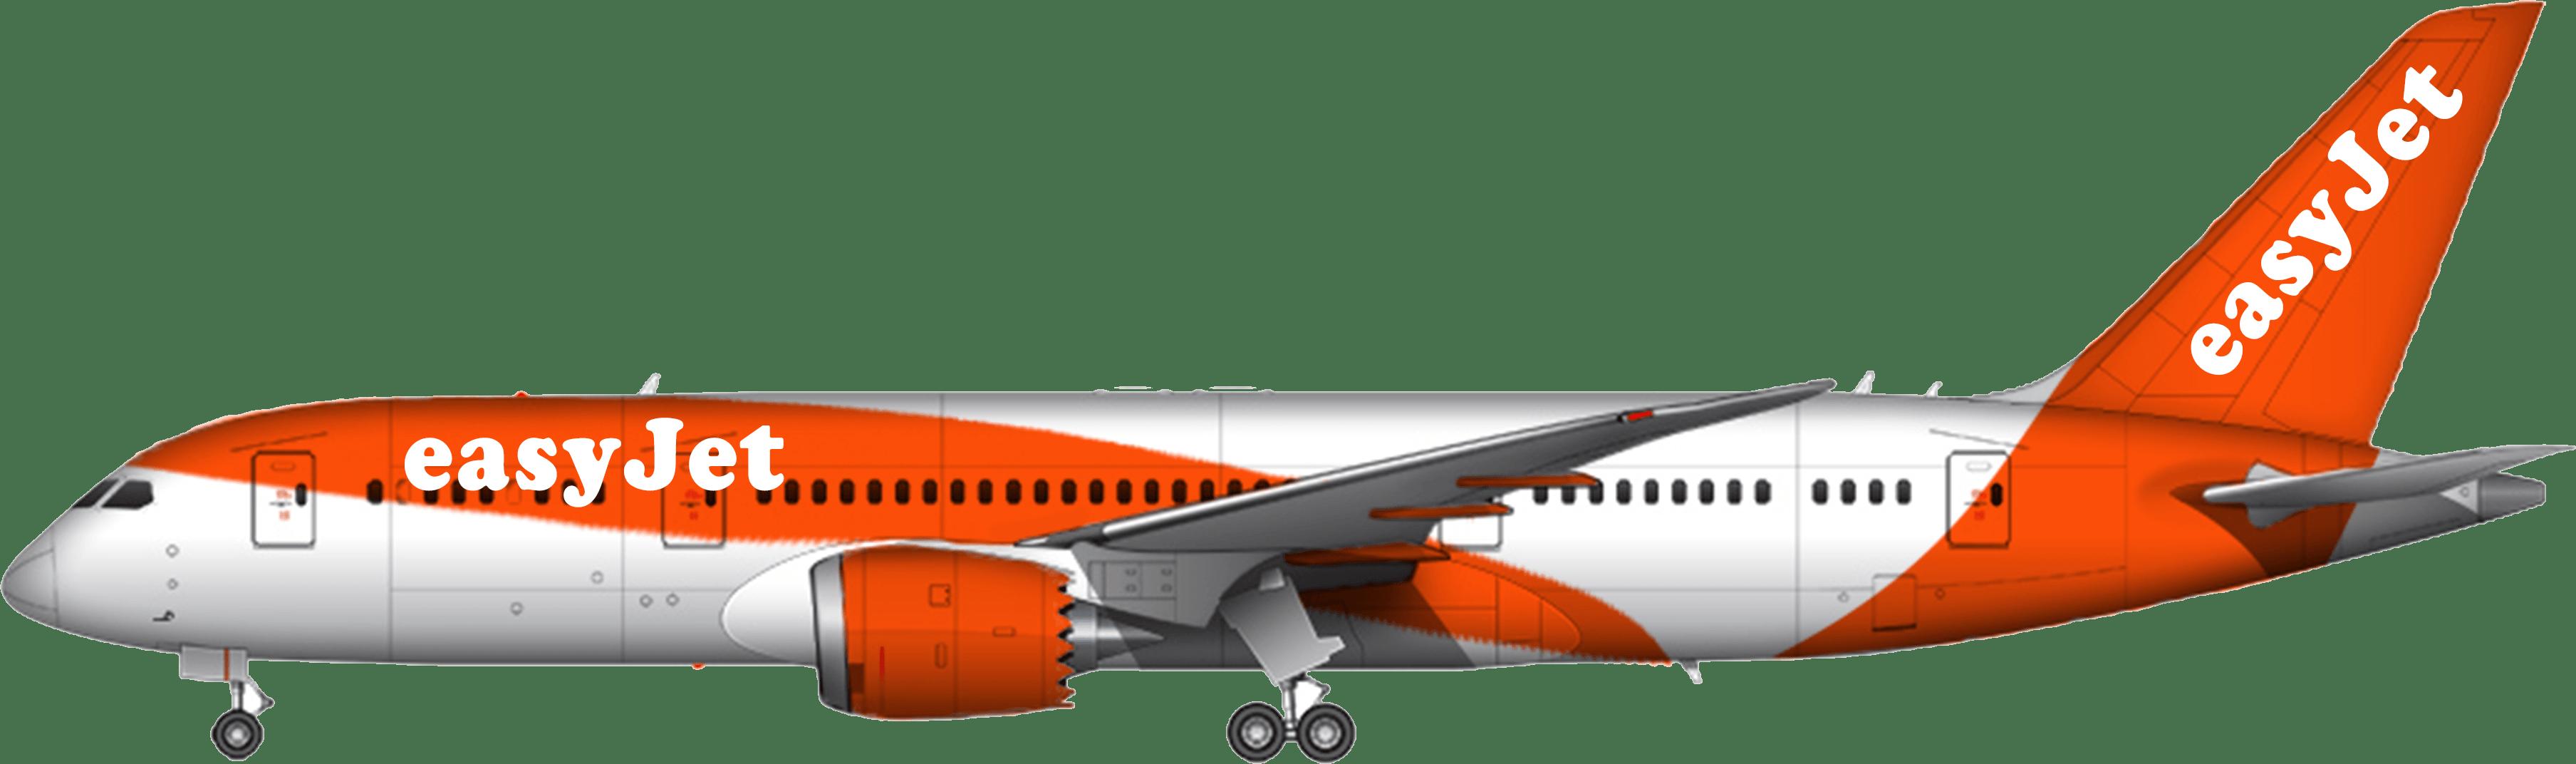 Easyjet PNG - 30089